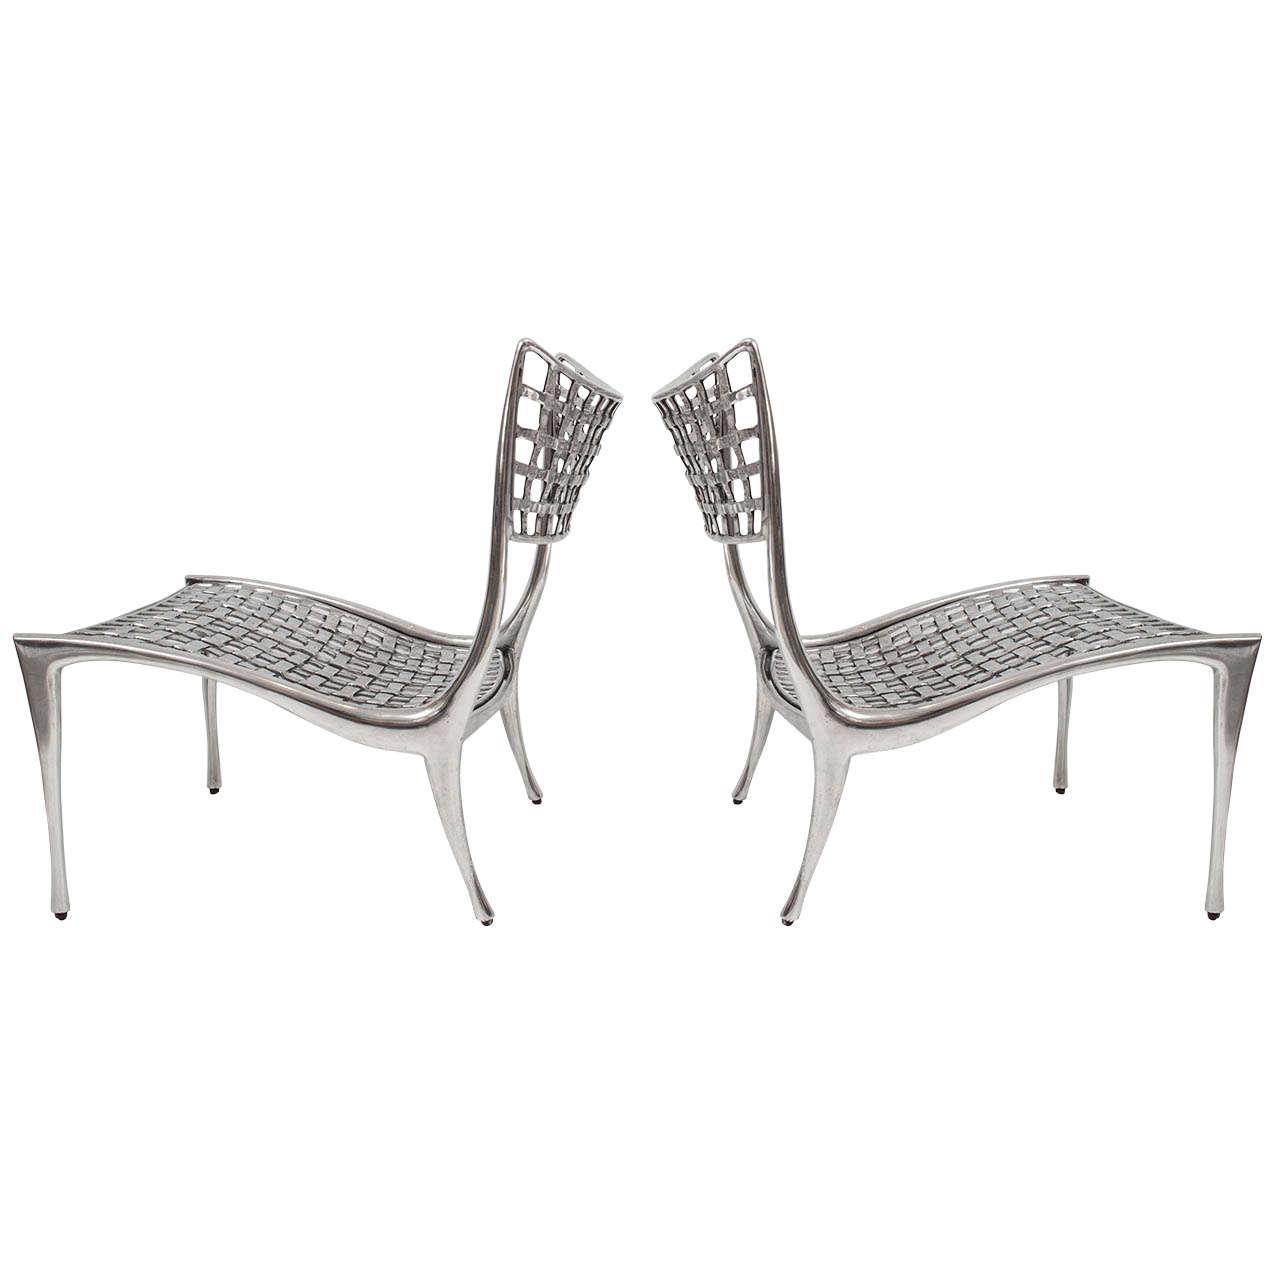 Dan Johnson Gazelle Lounge Chairs At 1stdibs